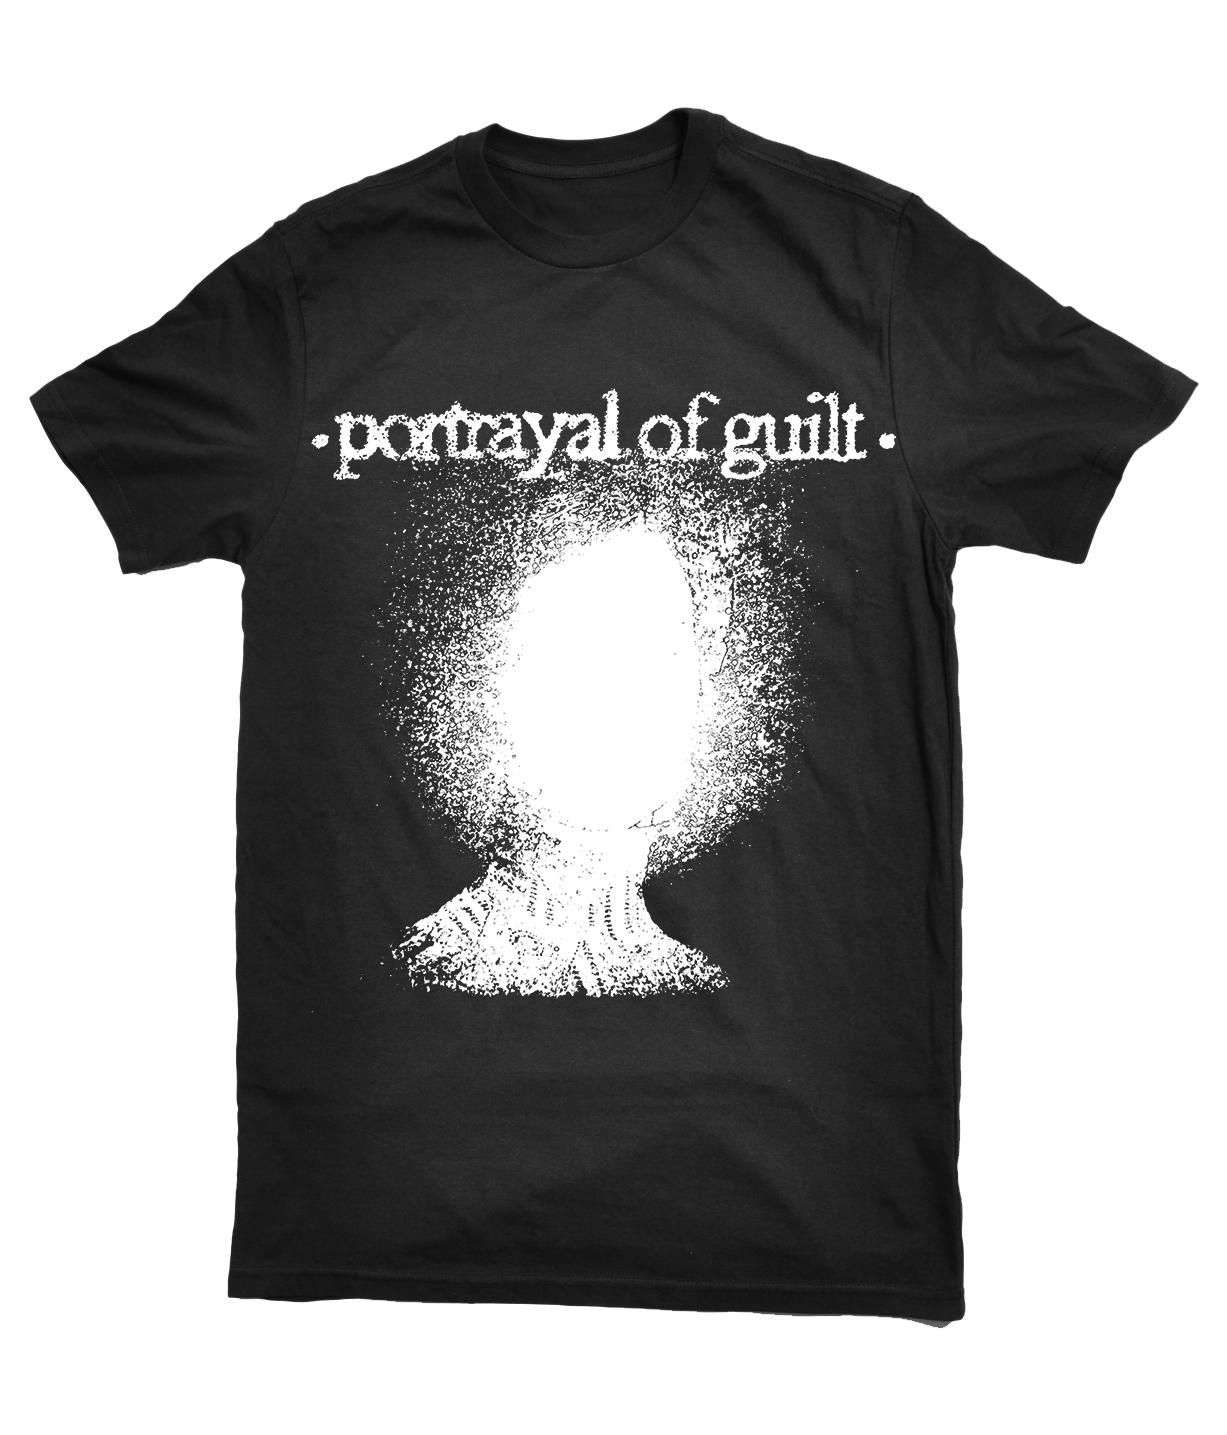 Portrayal of Guilt -  lightheaded shirt PREORDER